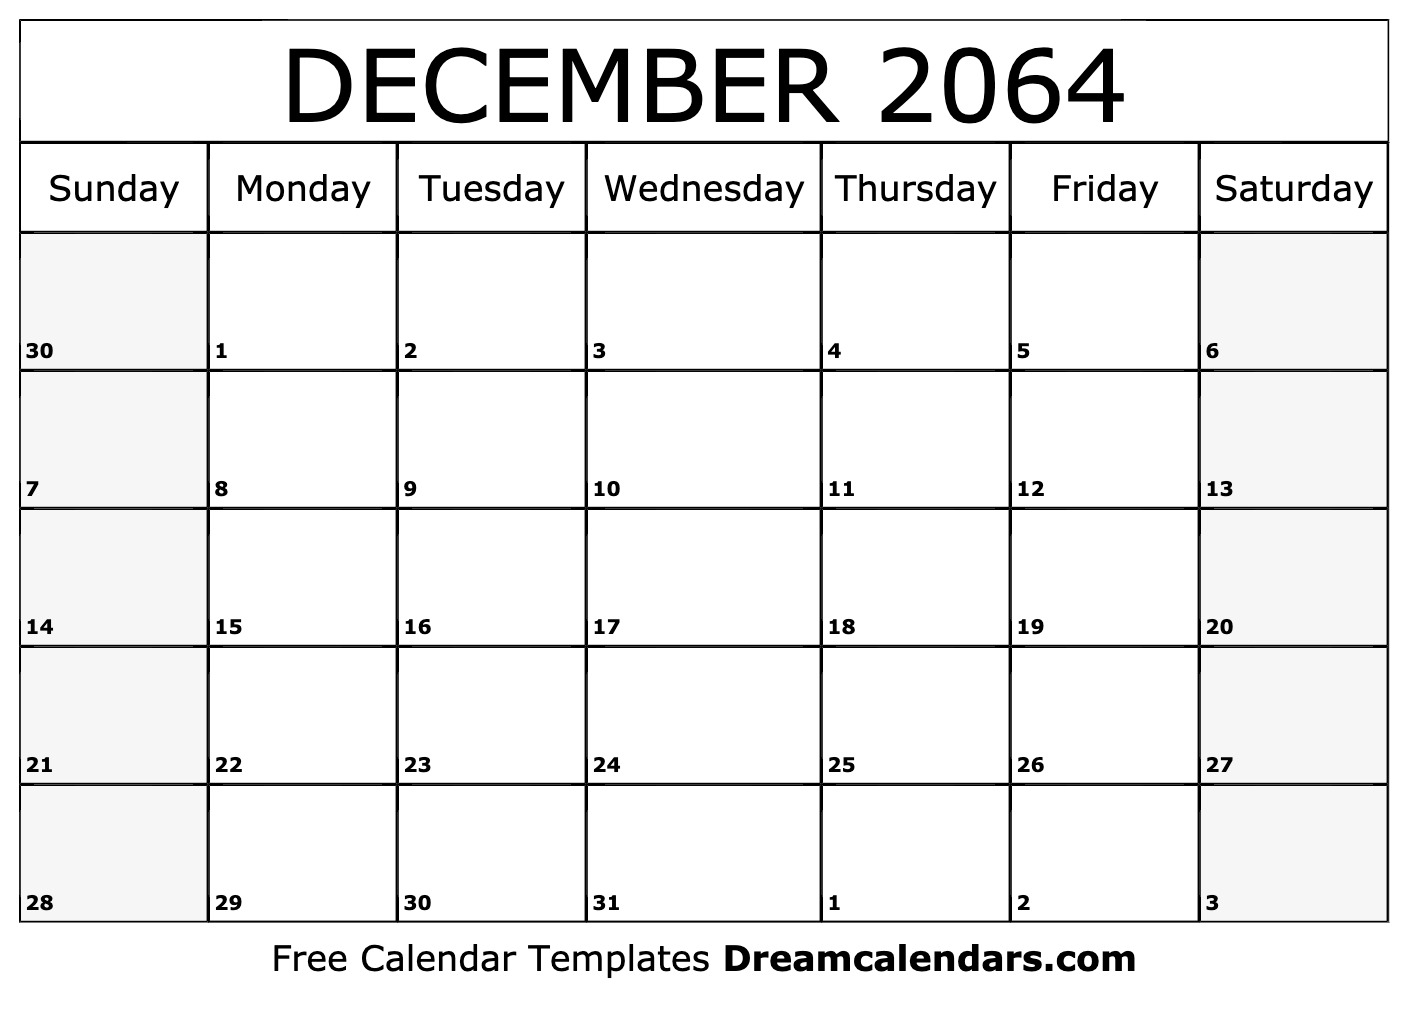 Free December 2064 Printable Calendar | Dream Calendars